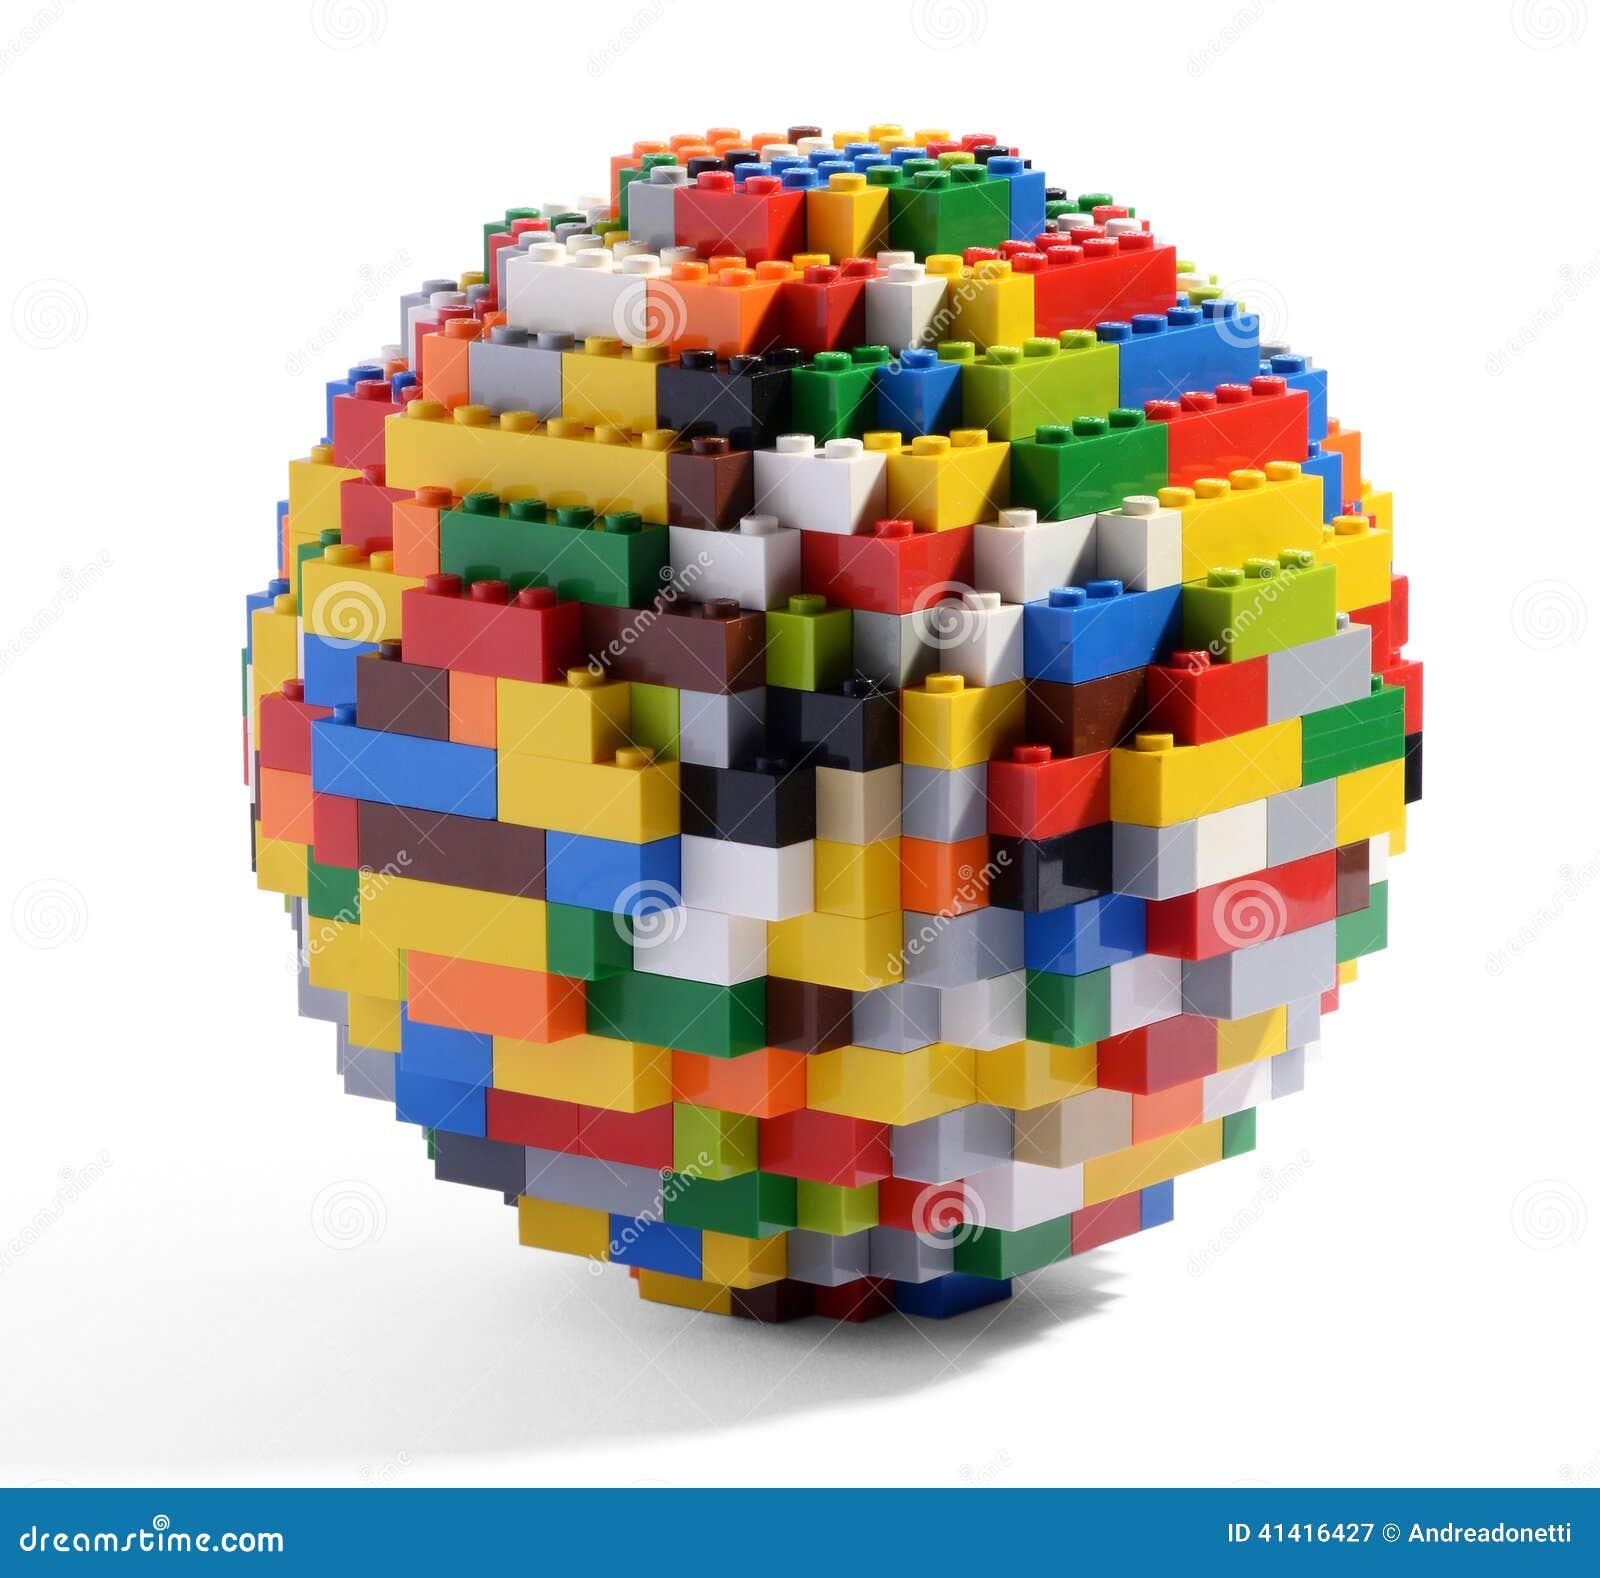 Globe or sphere of multicolored blocks